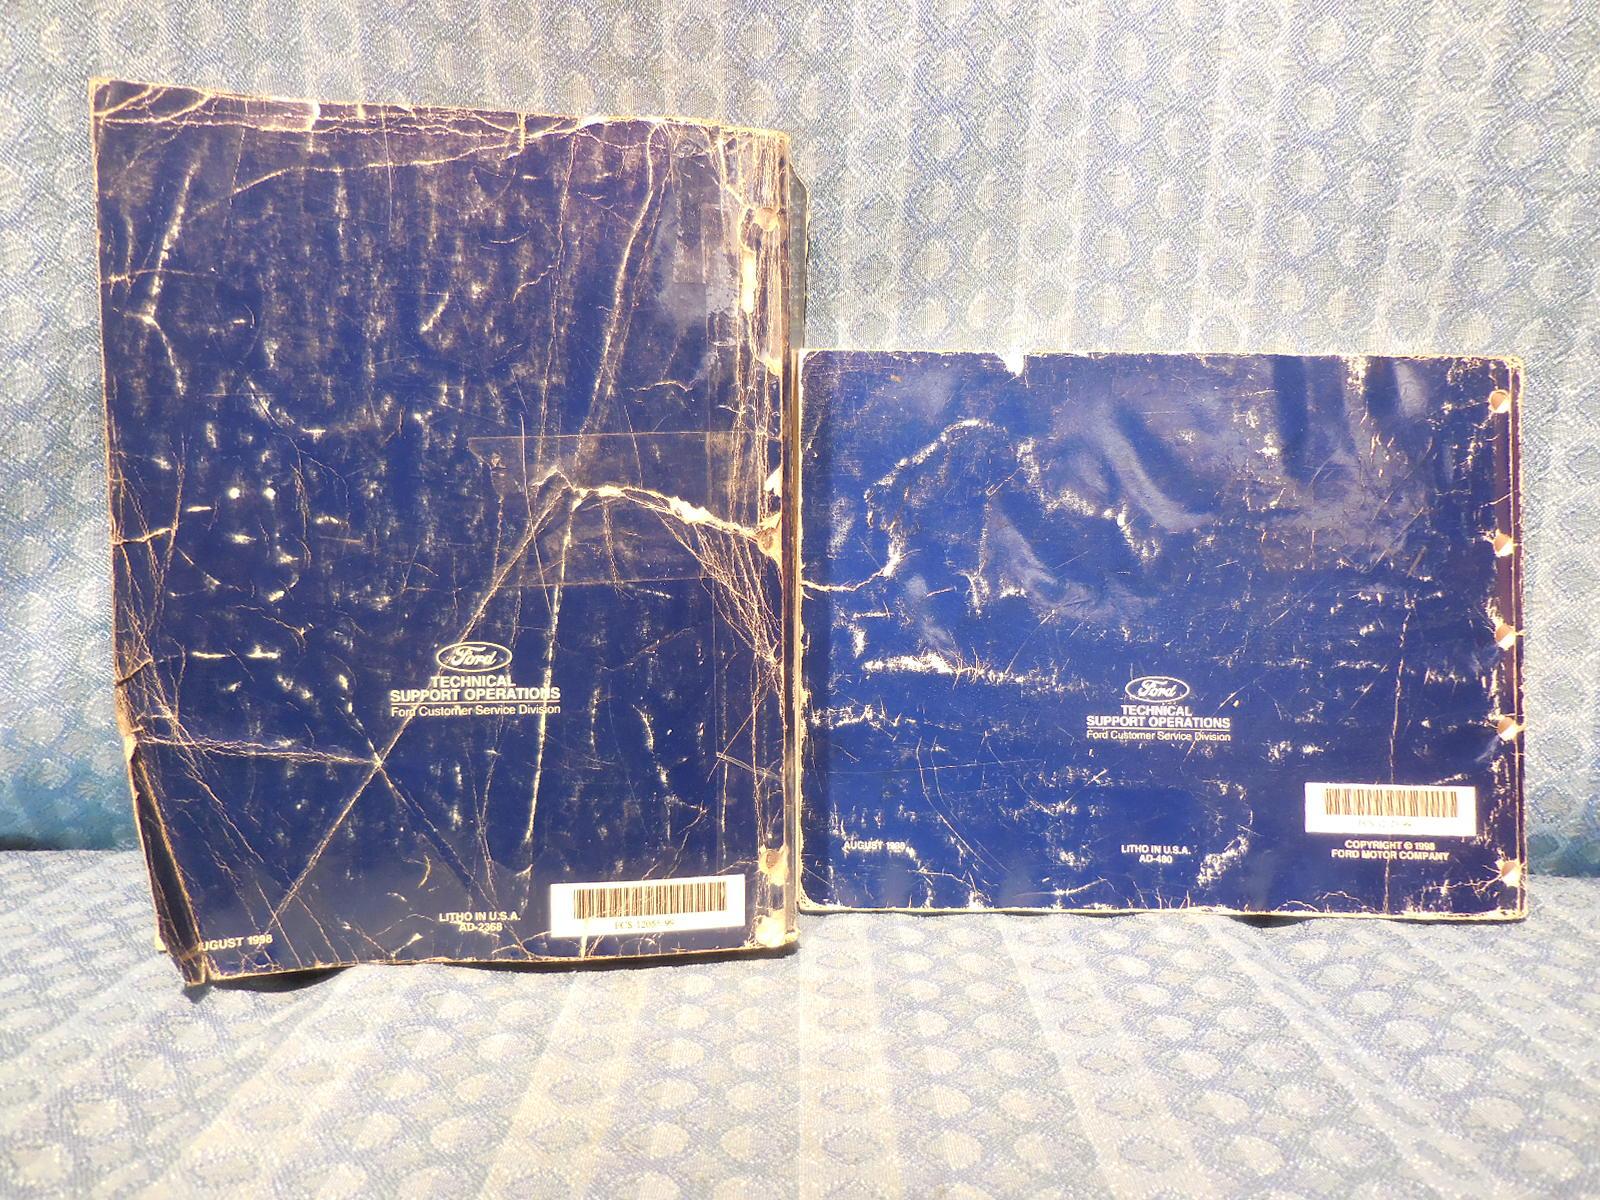 1999 Ford Taurus Mercury Sable OEM Original Shop / Service Manual 2 Volume  Set